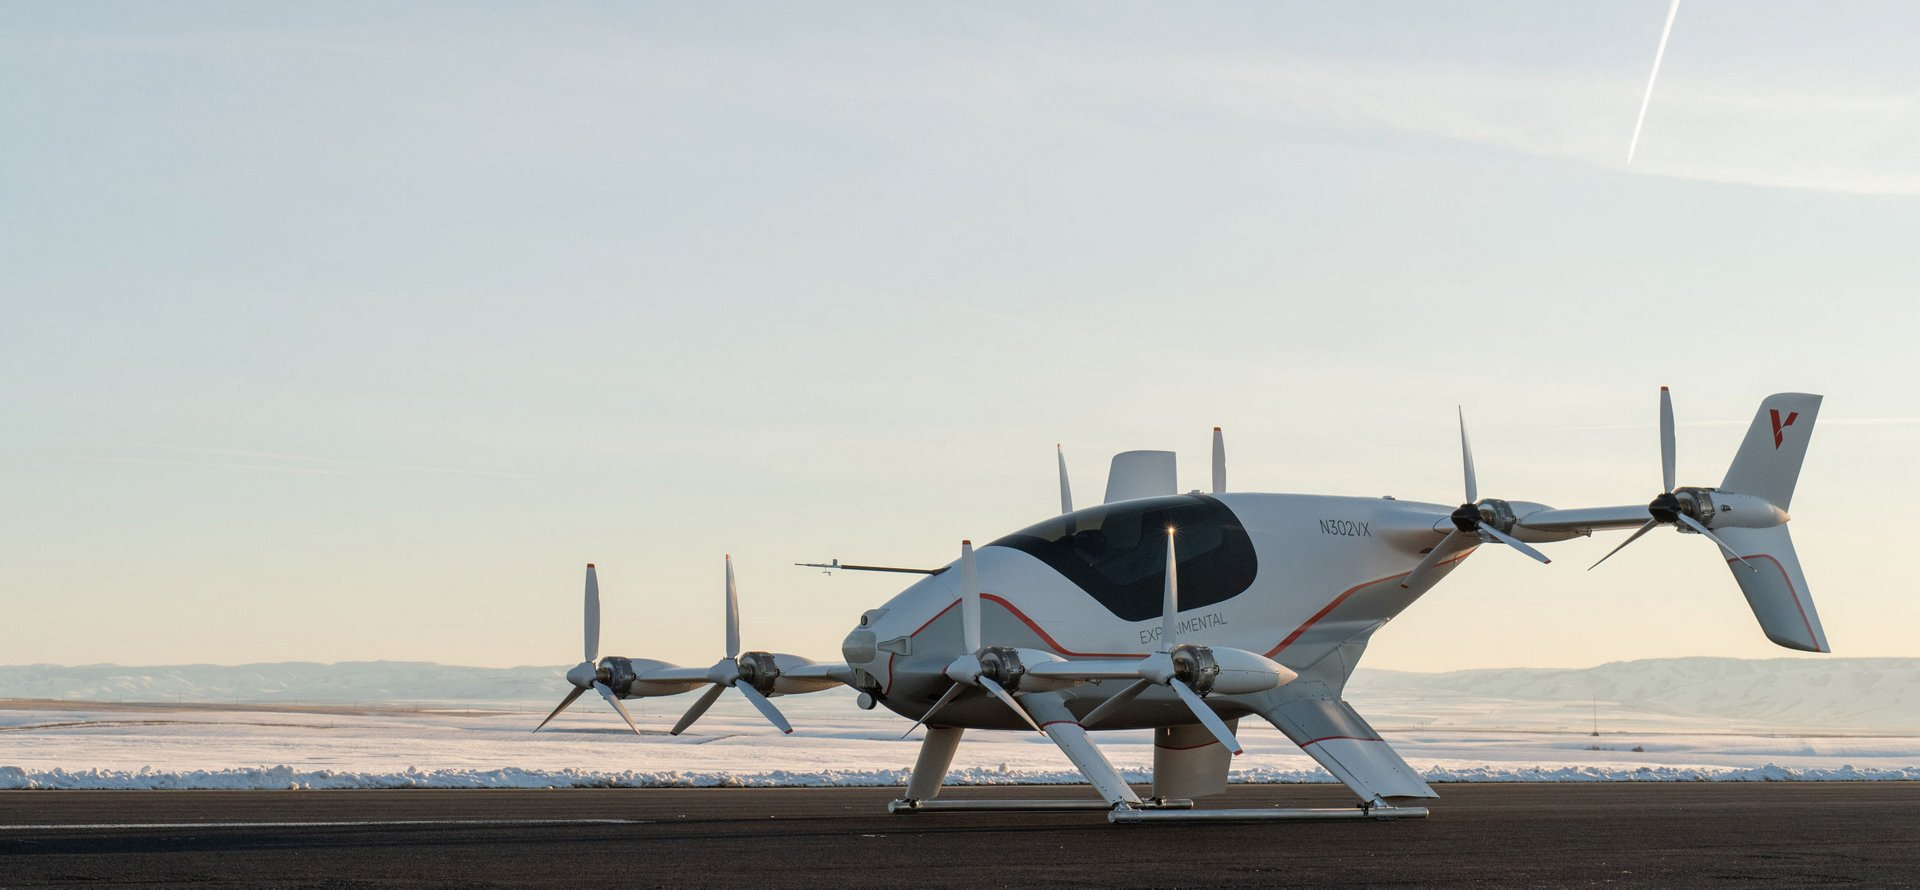 The autonomous eVTOL technology demonstrator, Vahana, performed its first flight on 31 January 2018